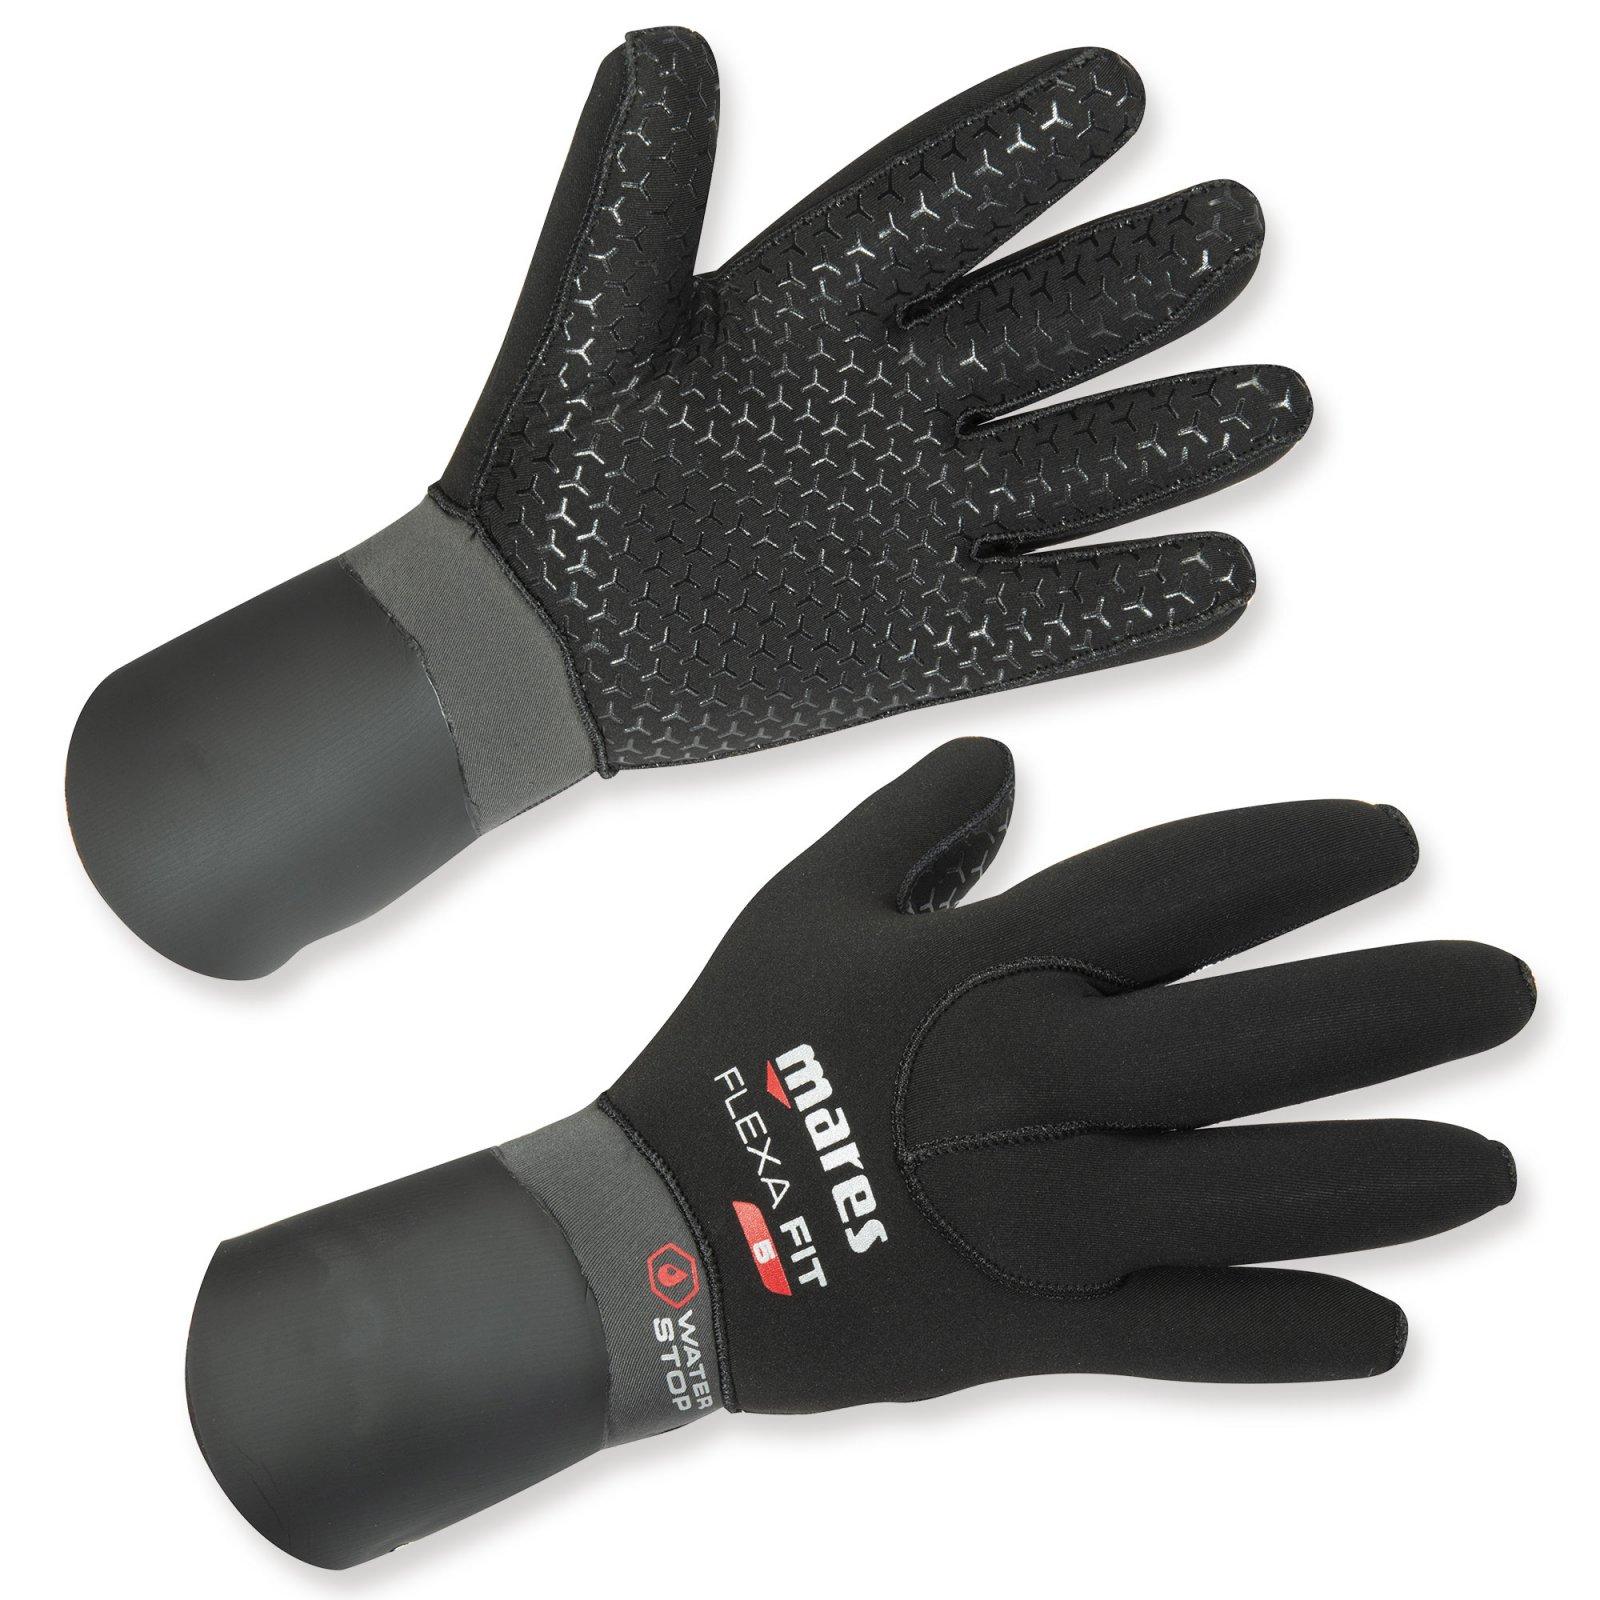 Flexa Fit 5mm Glove